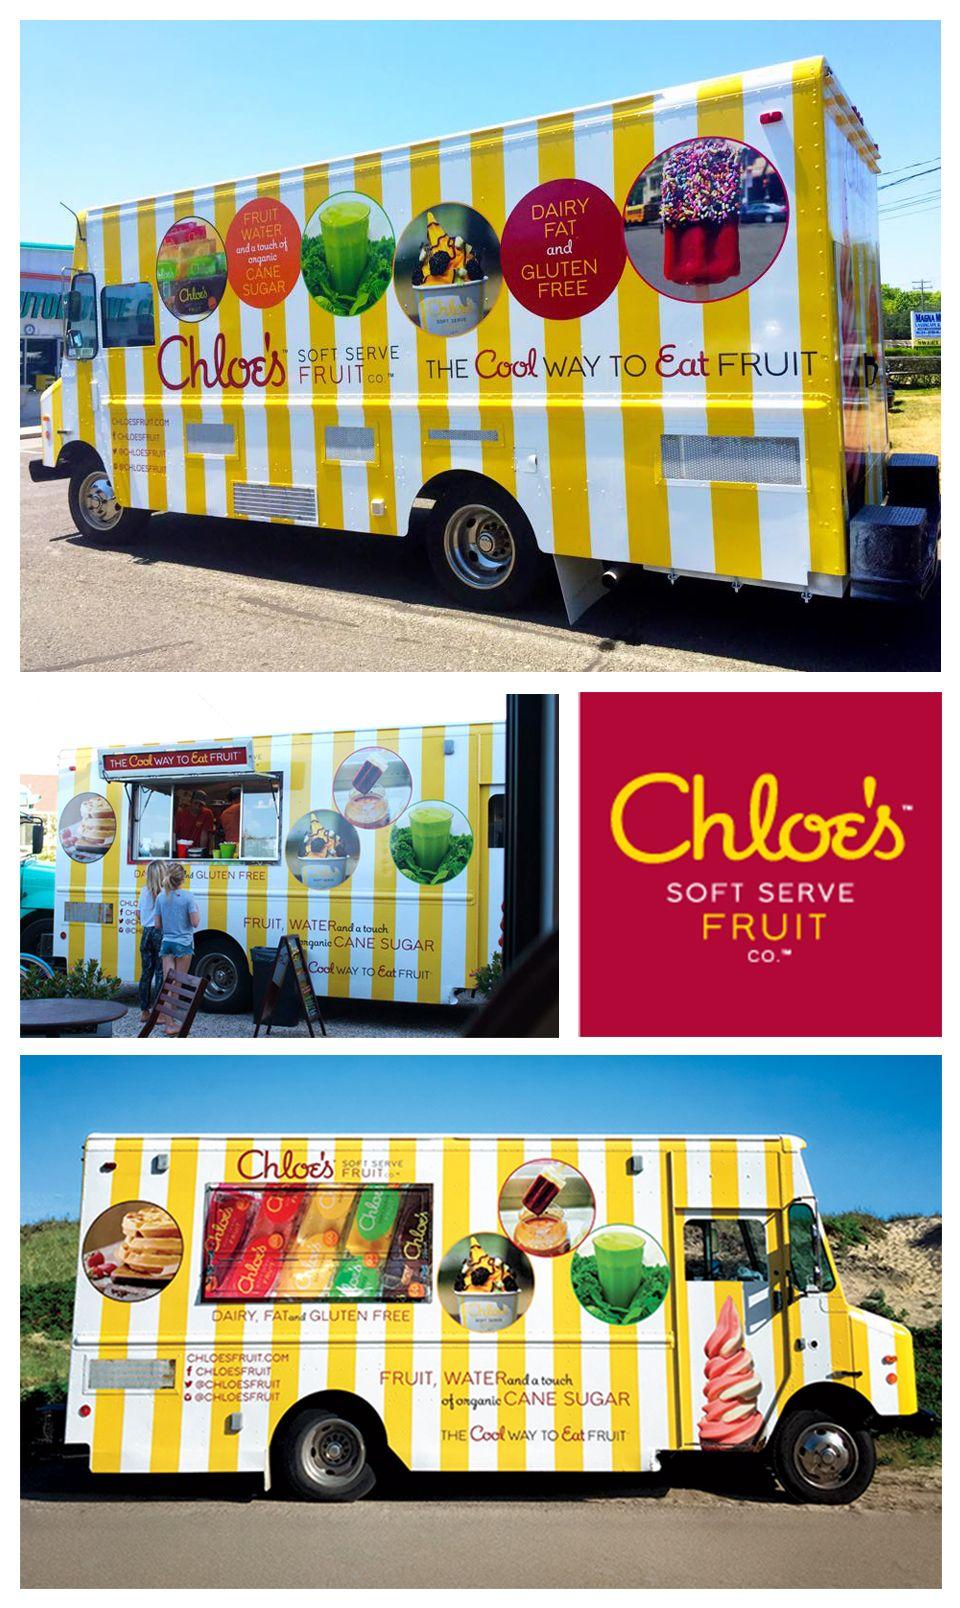 Chloes soft serve fruit food truck ny vending